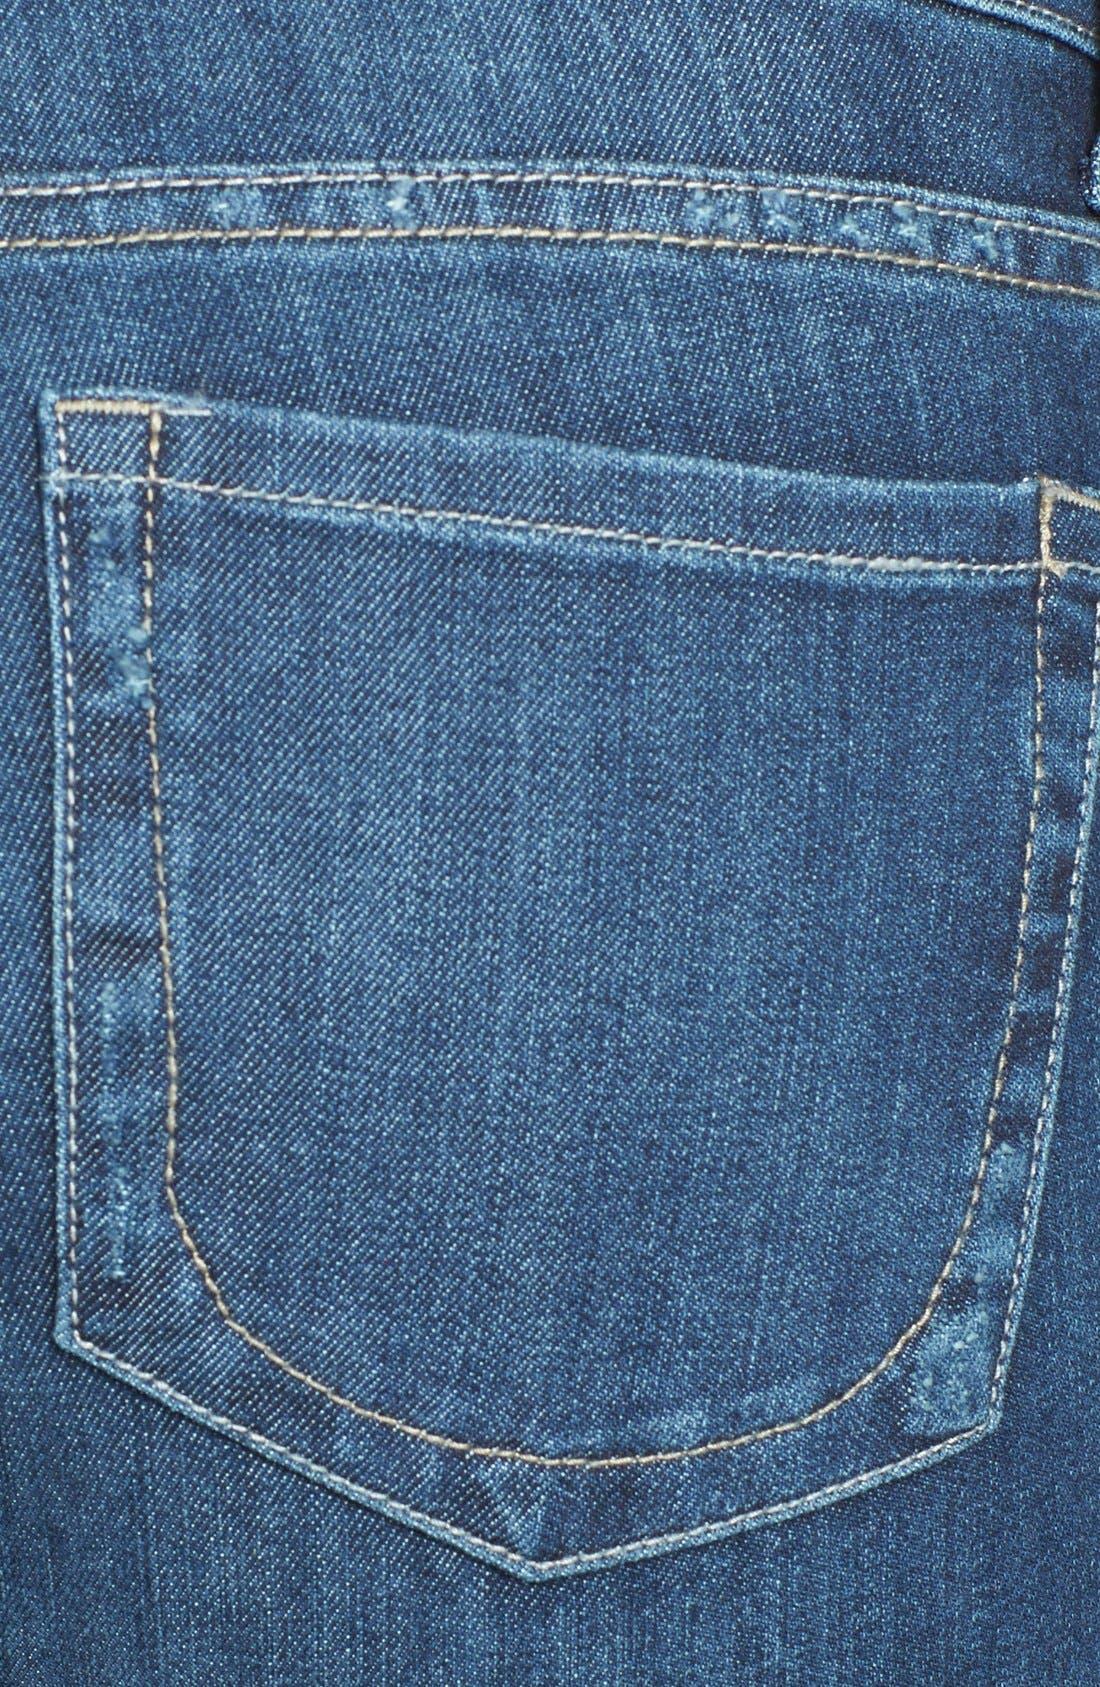 Alternate Image 3  - KUT from the Kloth 'Mia' Stretch Skinny Jeans (Effect) (Regular & Petite)